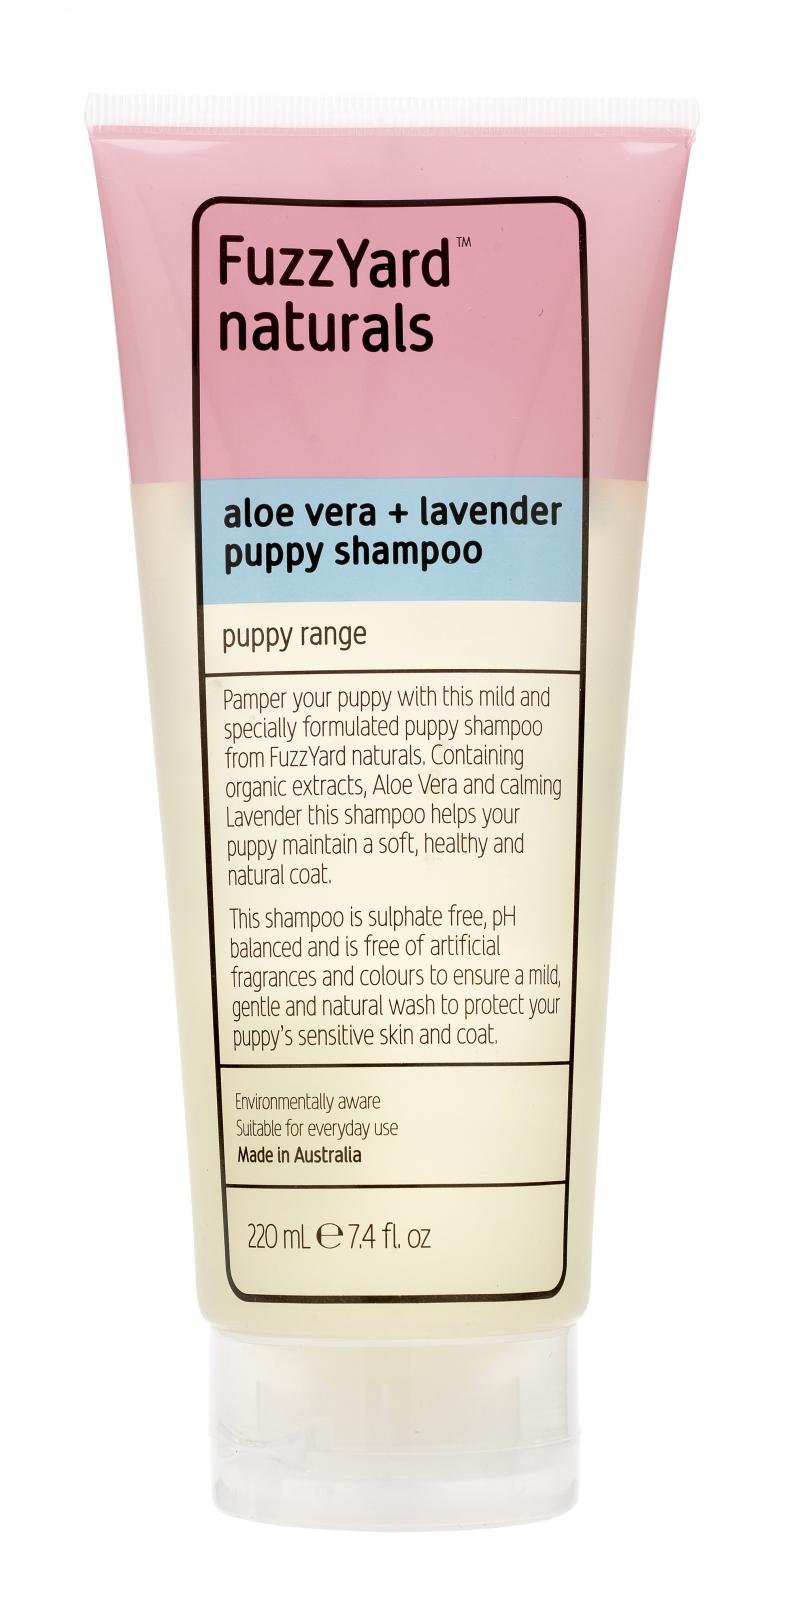 Puppy Aloe Vera & Lavender Shampoo by FuzzYard